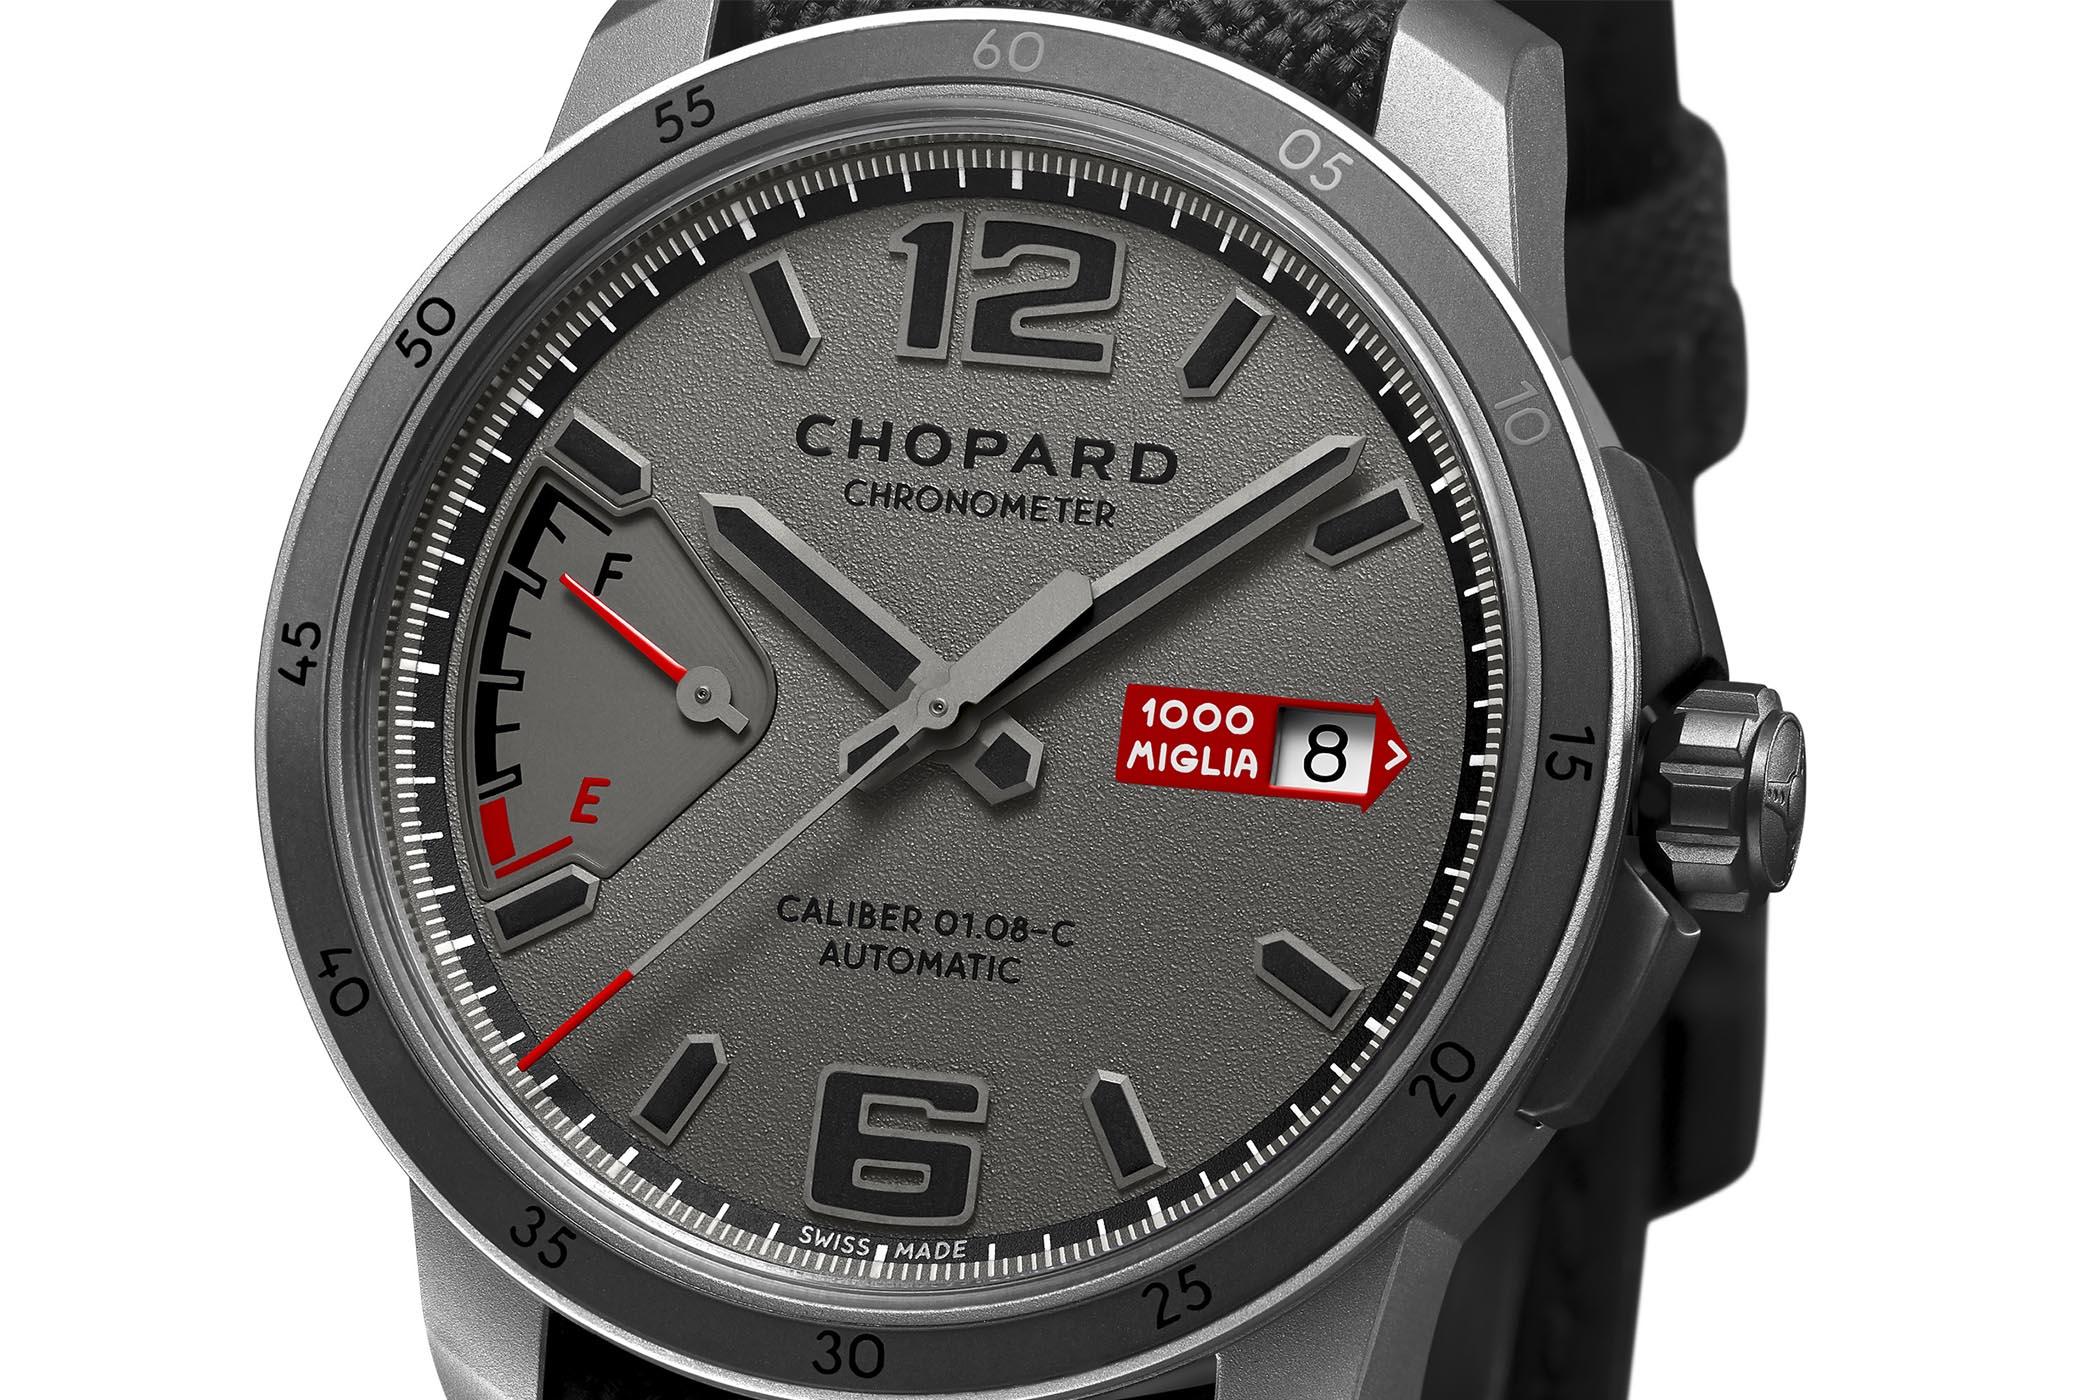 Chopard Mille Miglia GTS Power Control Grigio Speciale shotblasted titanium